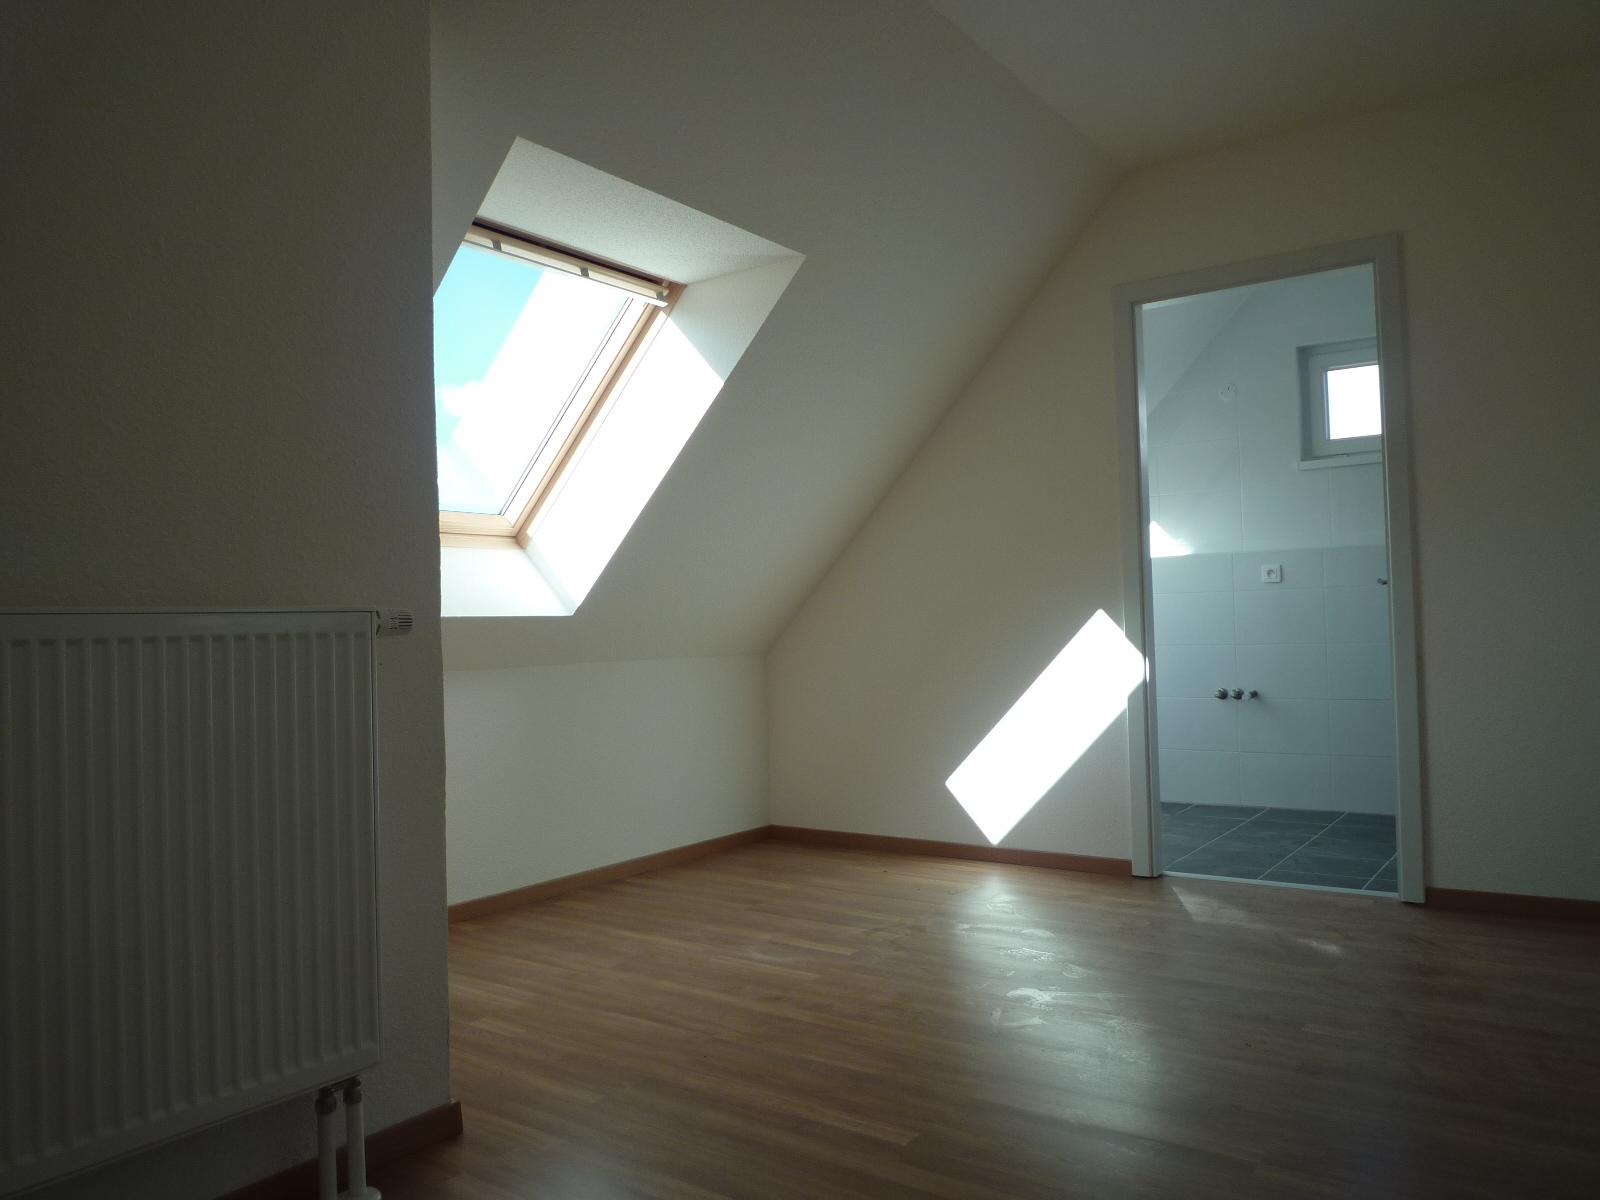 Eligible loi Pinel 21% - LINGOLSHEIM - nos maisons & appartements neufs - Beausite Immobilier 2